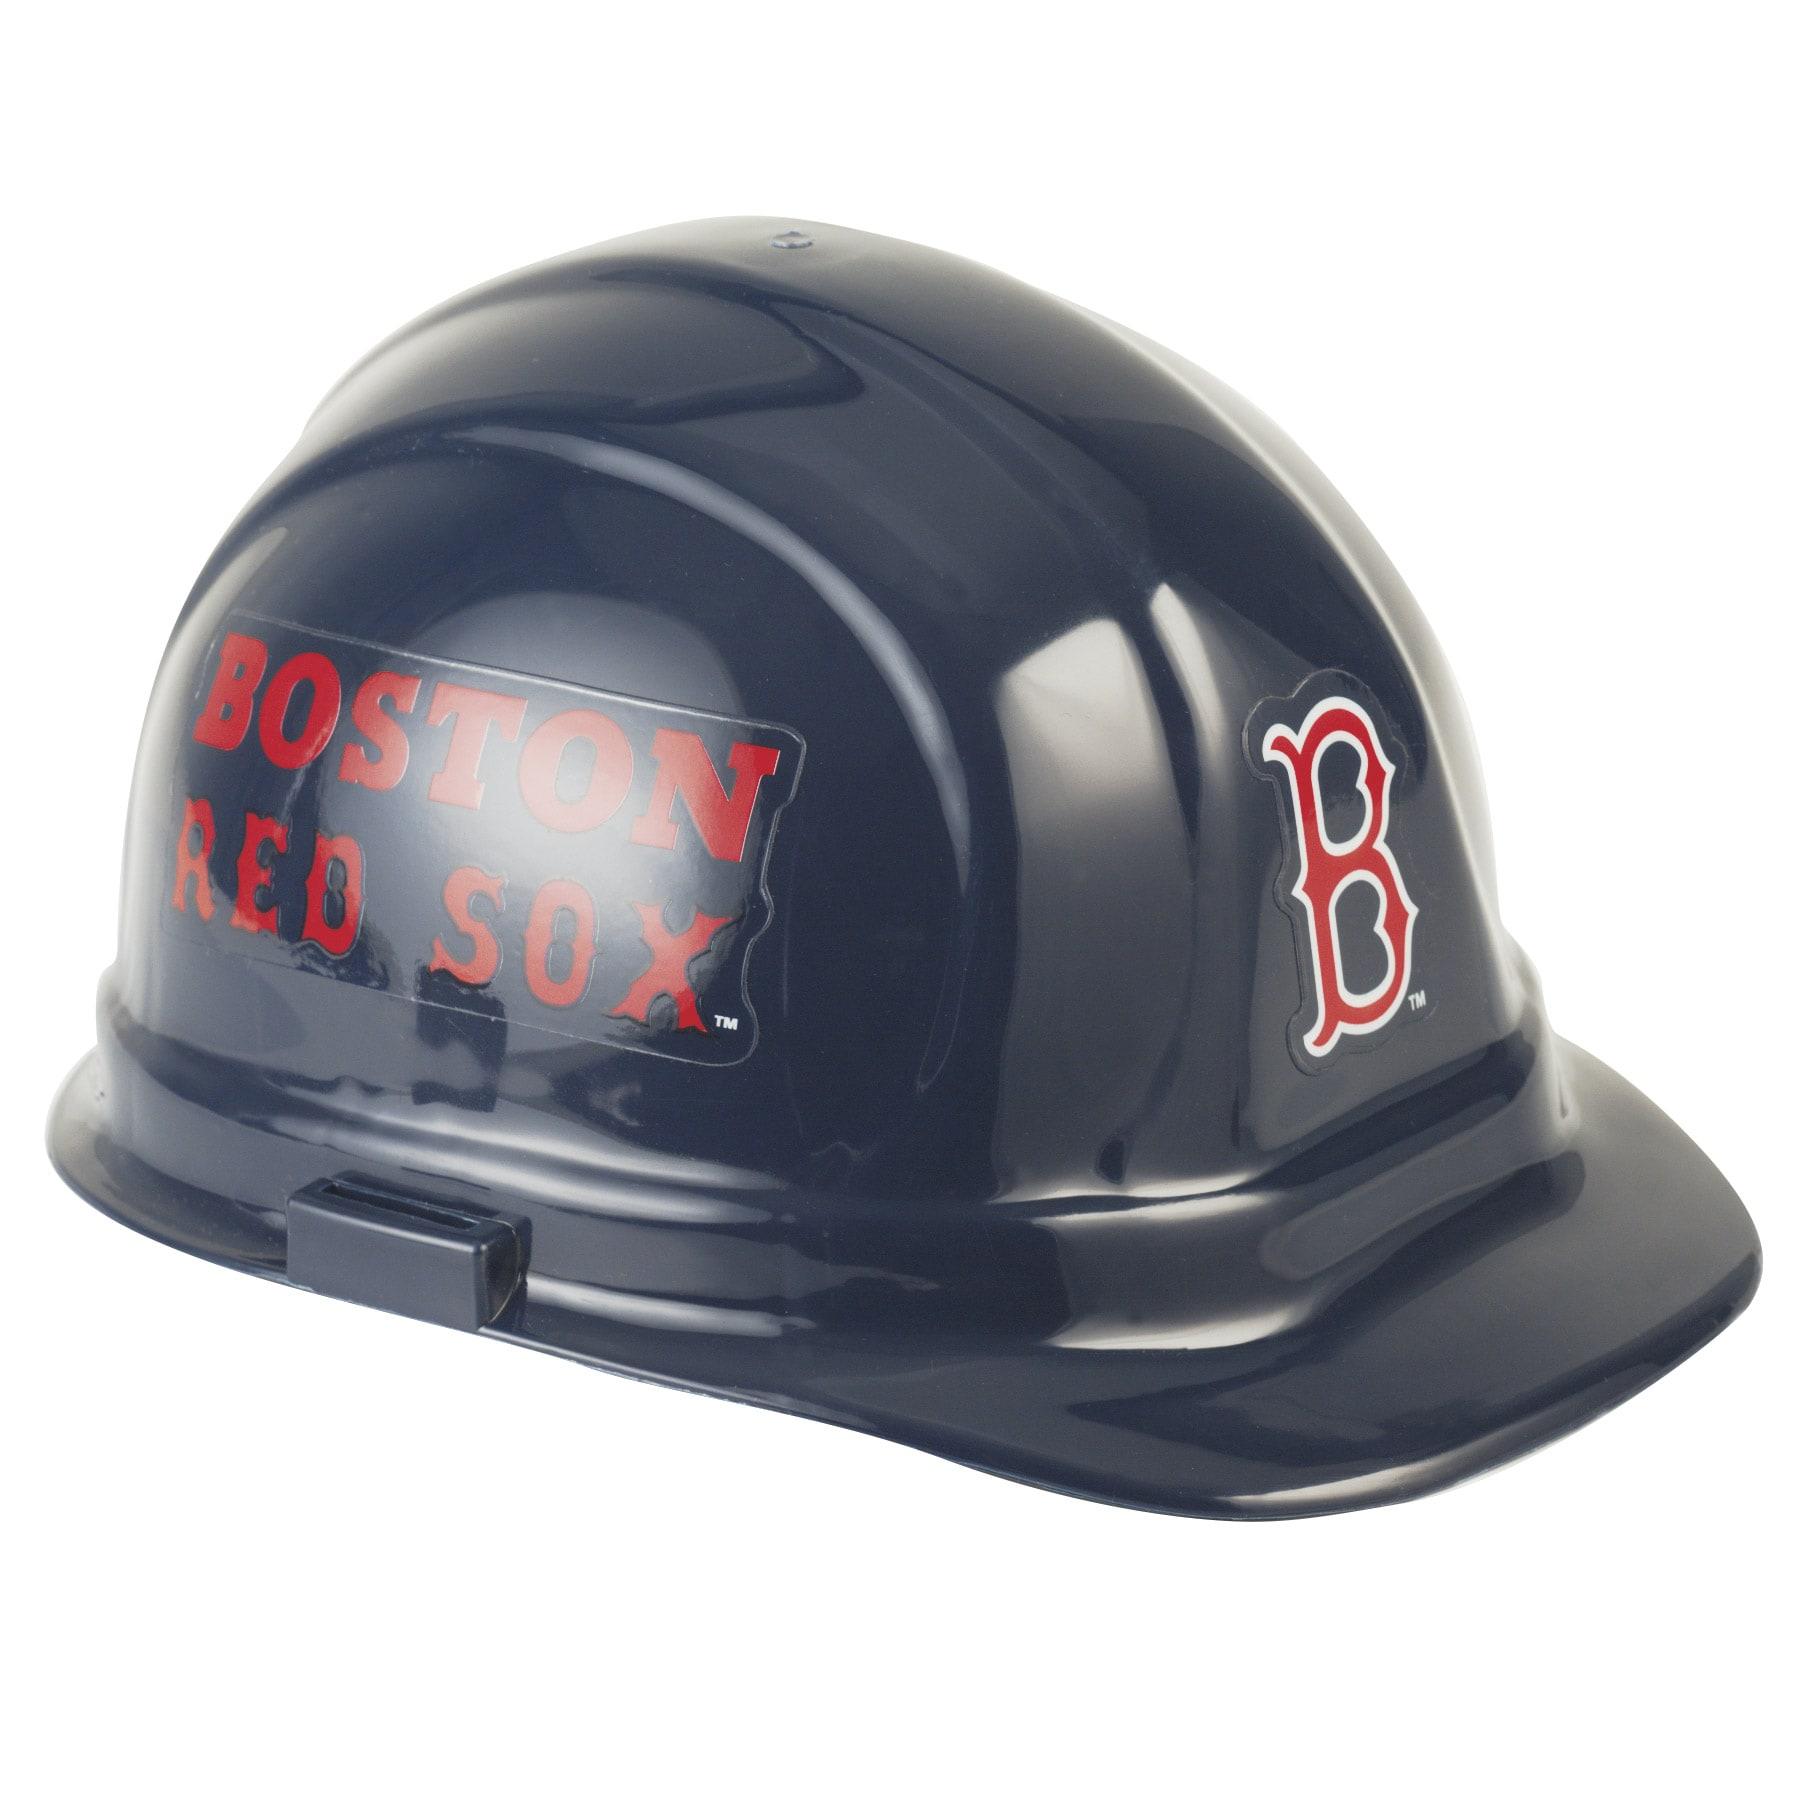 Boston Red Sox WinCraft Team Construction Hard Hat